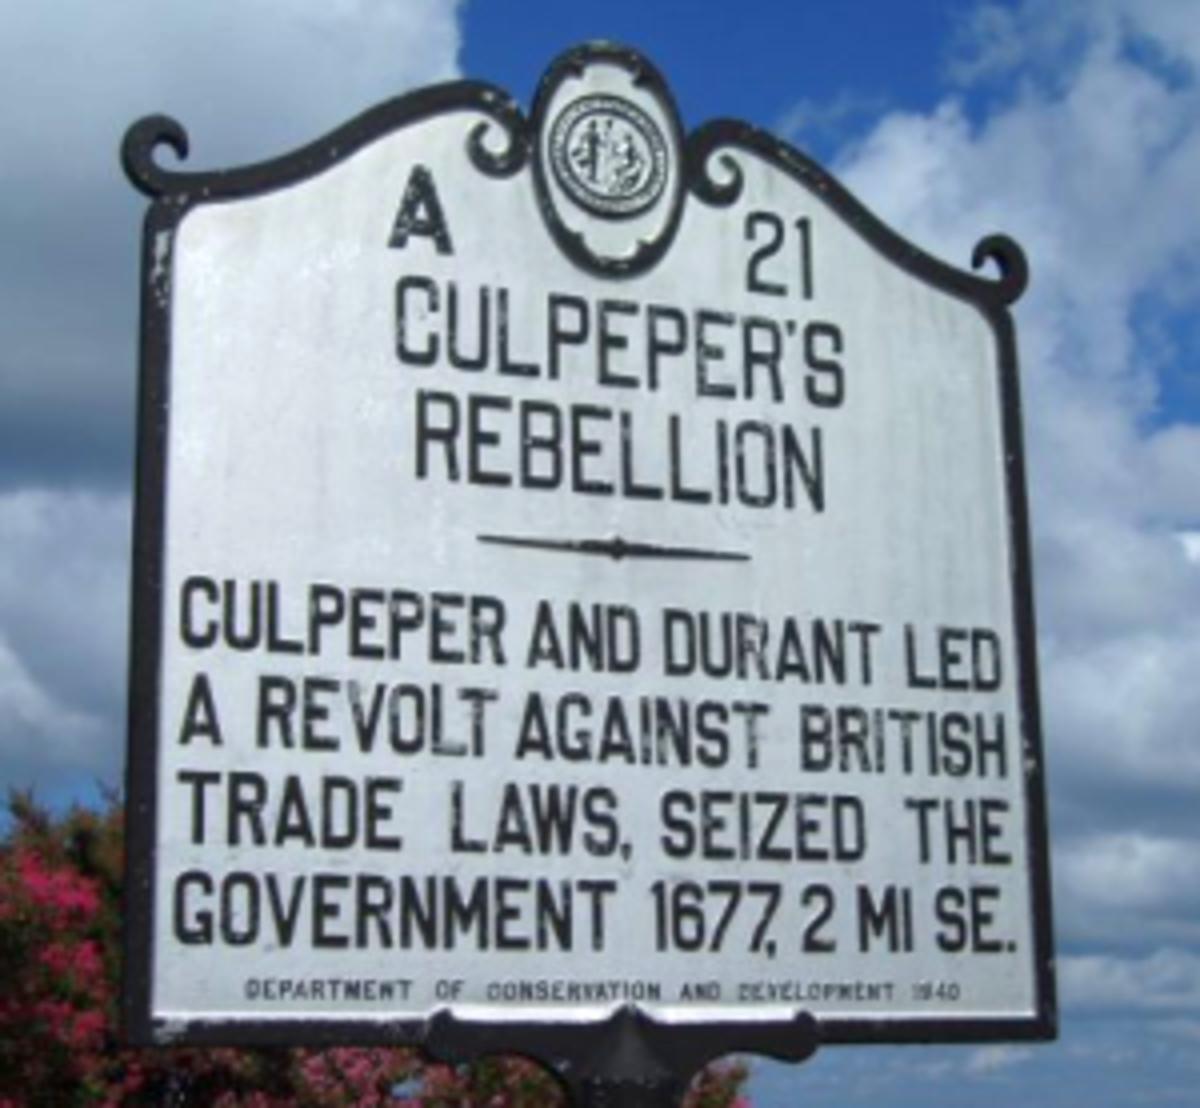 Placemarker for Culpeper's Rebellion in North Carolina.